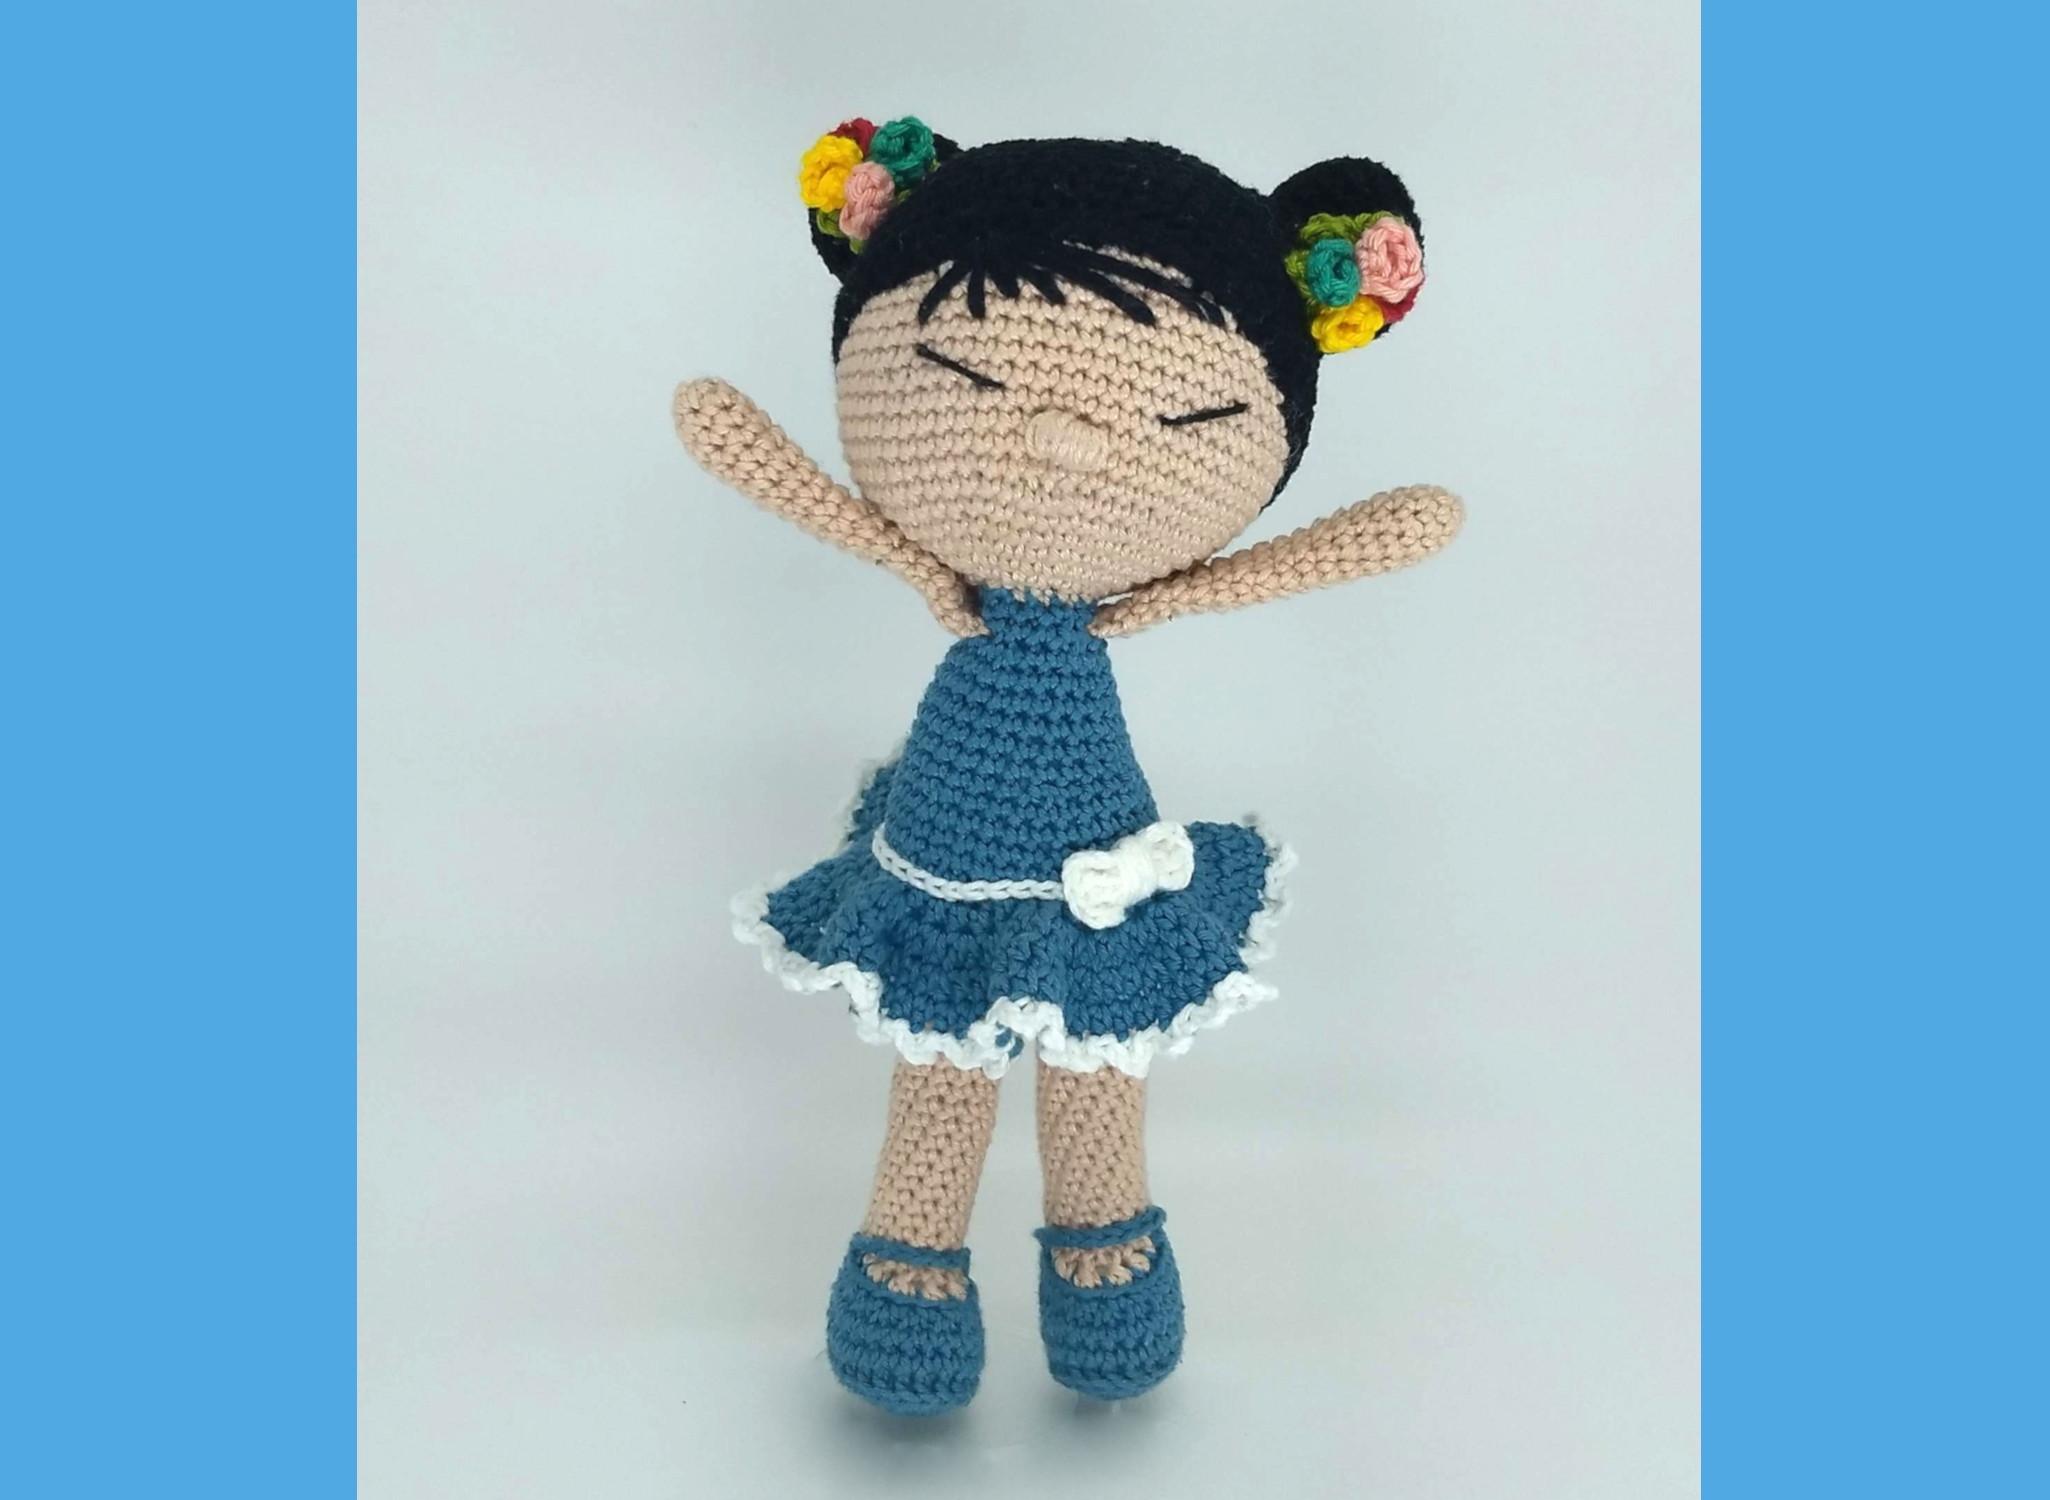 Best 10 Boneca amigurumi/ boneca crochê no Elo7 | Novelo de idéias ... | 1500x2050